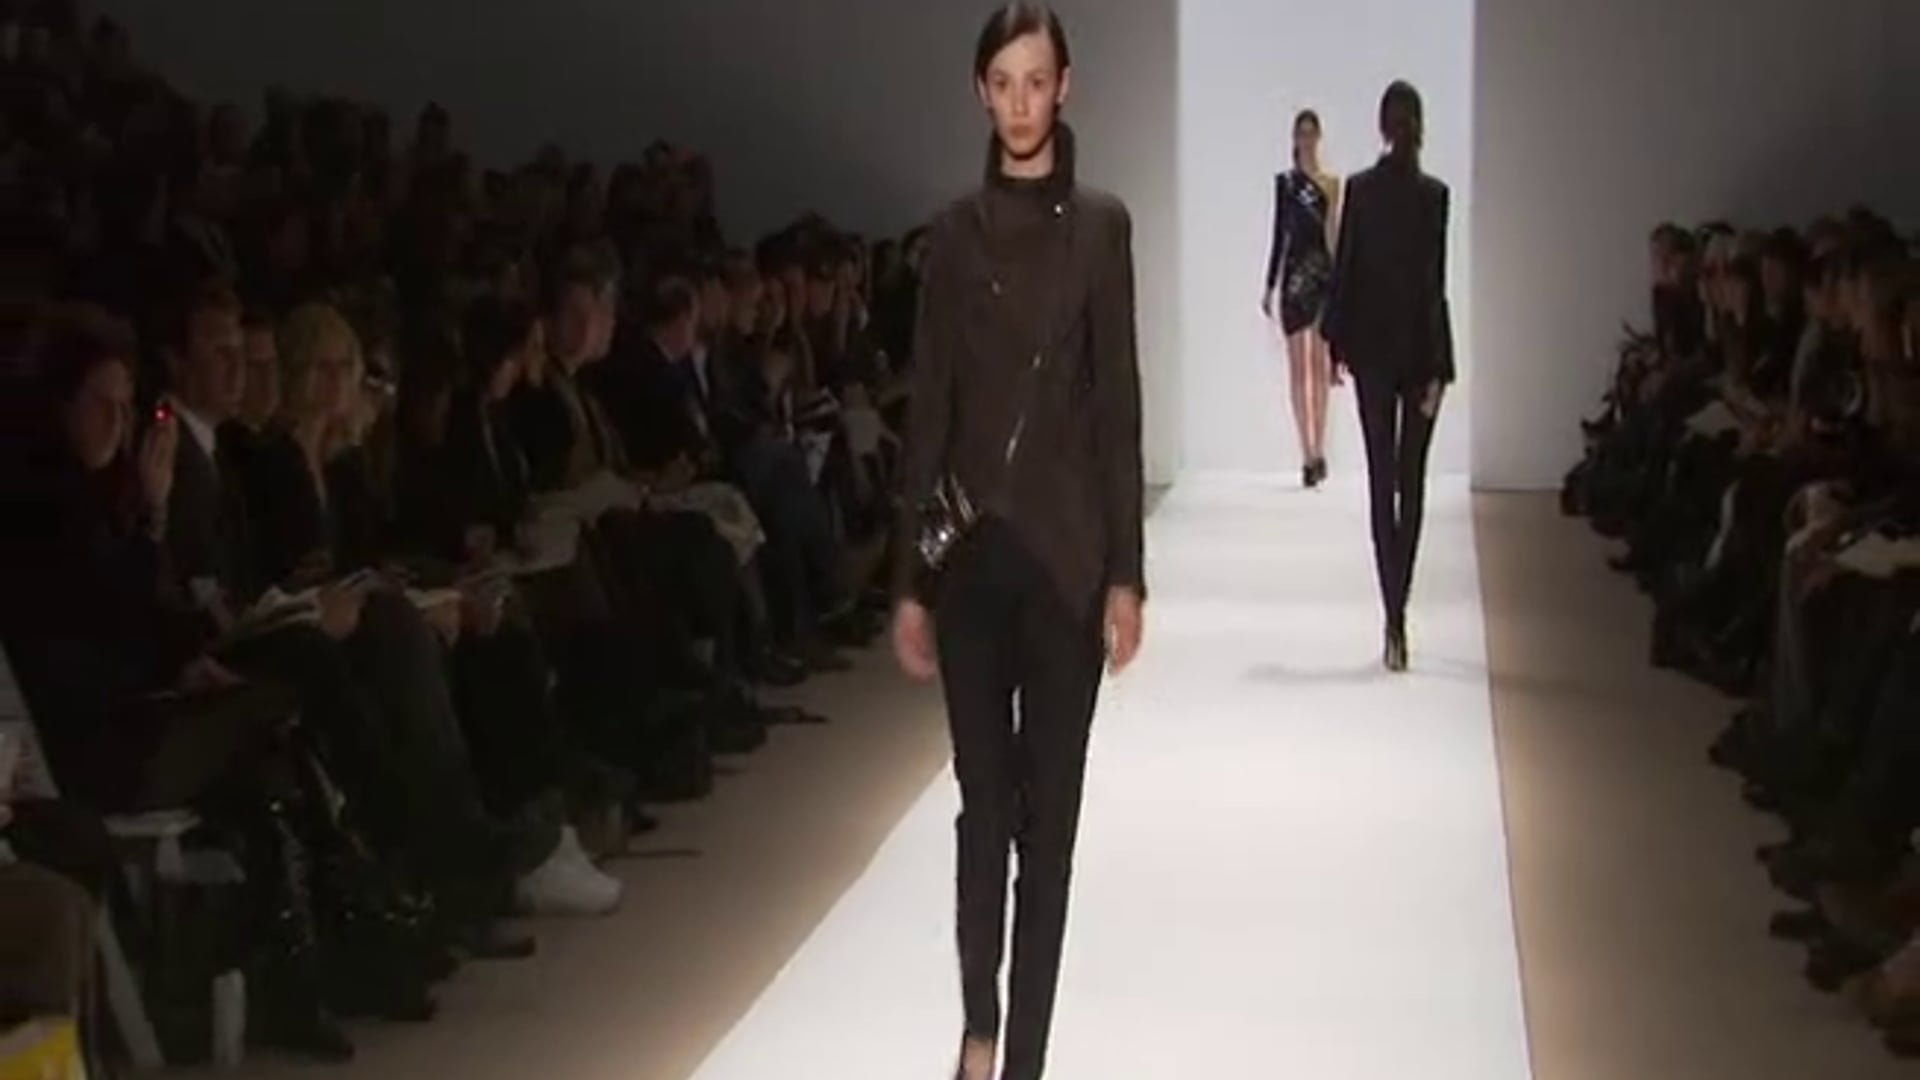 Mercedes Benz American Express 'Fashion Week Moment'